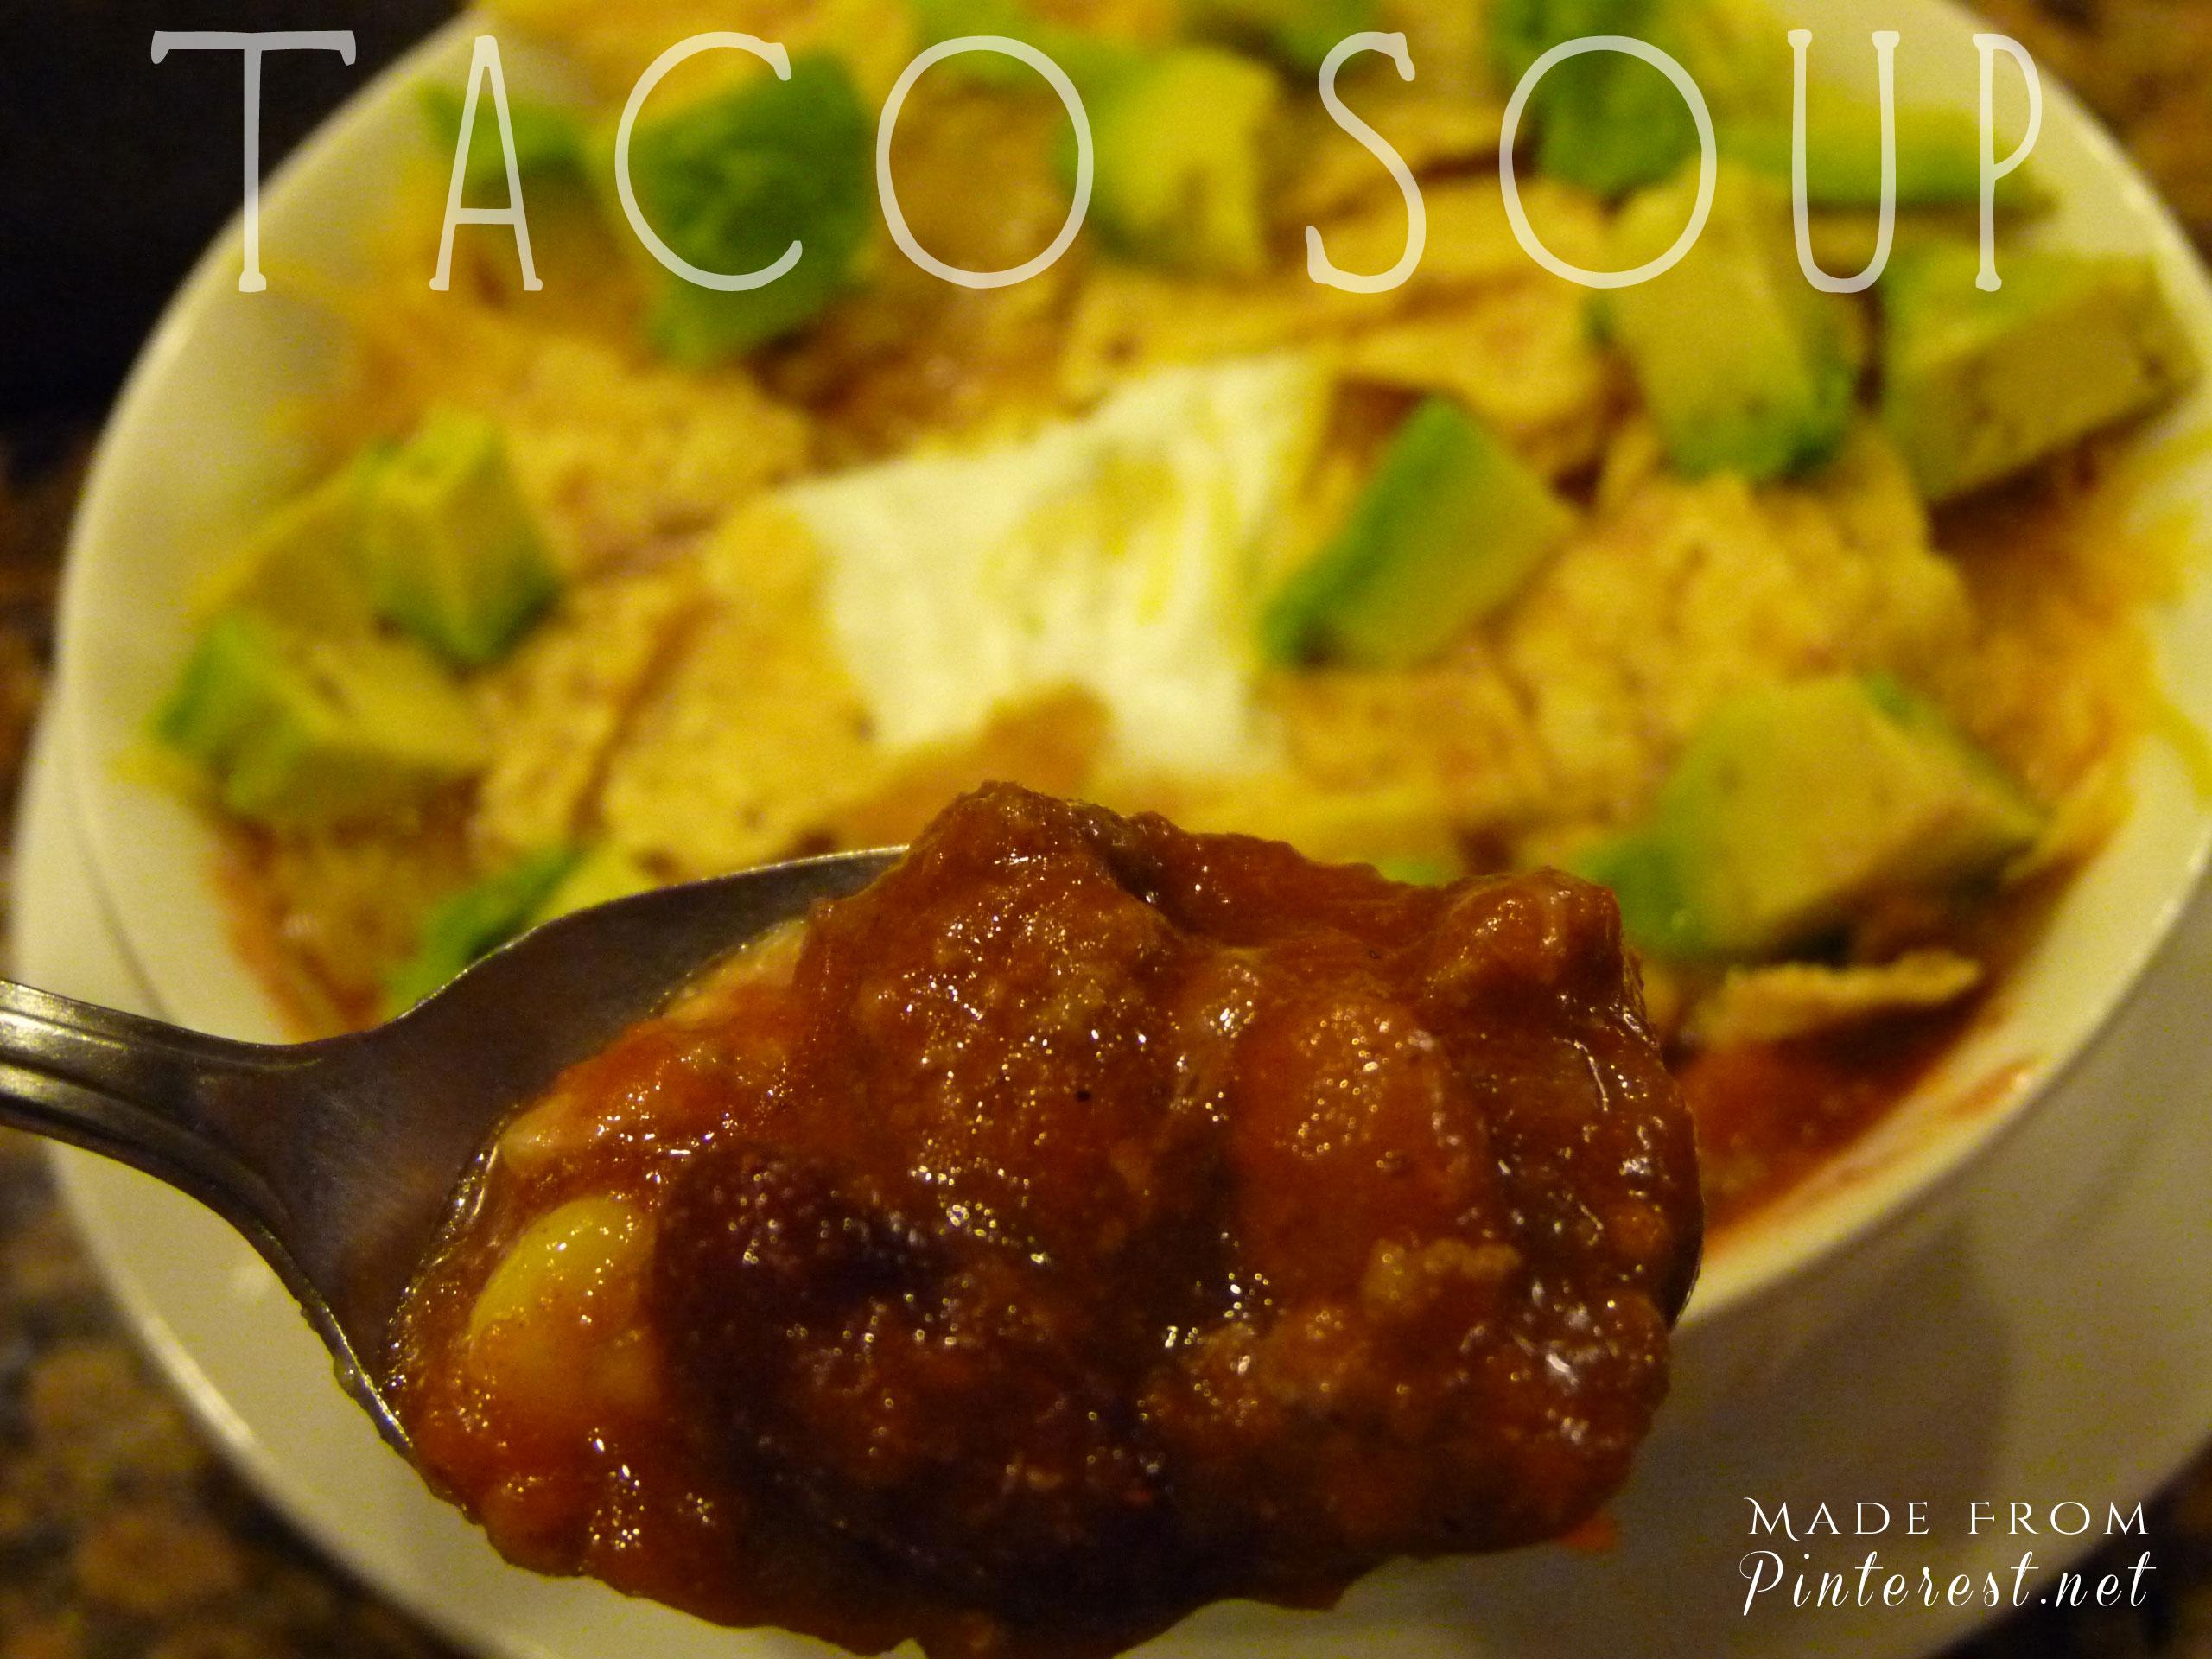 Taco Soup from Paula Dean